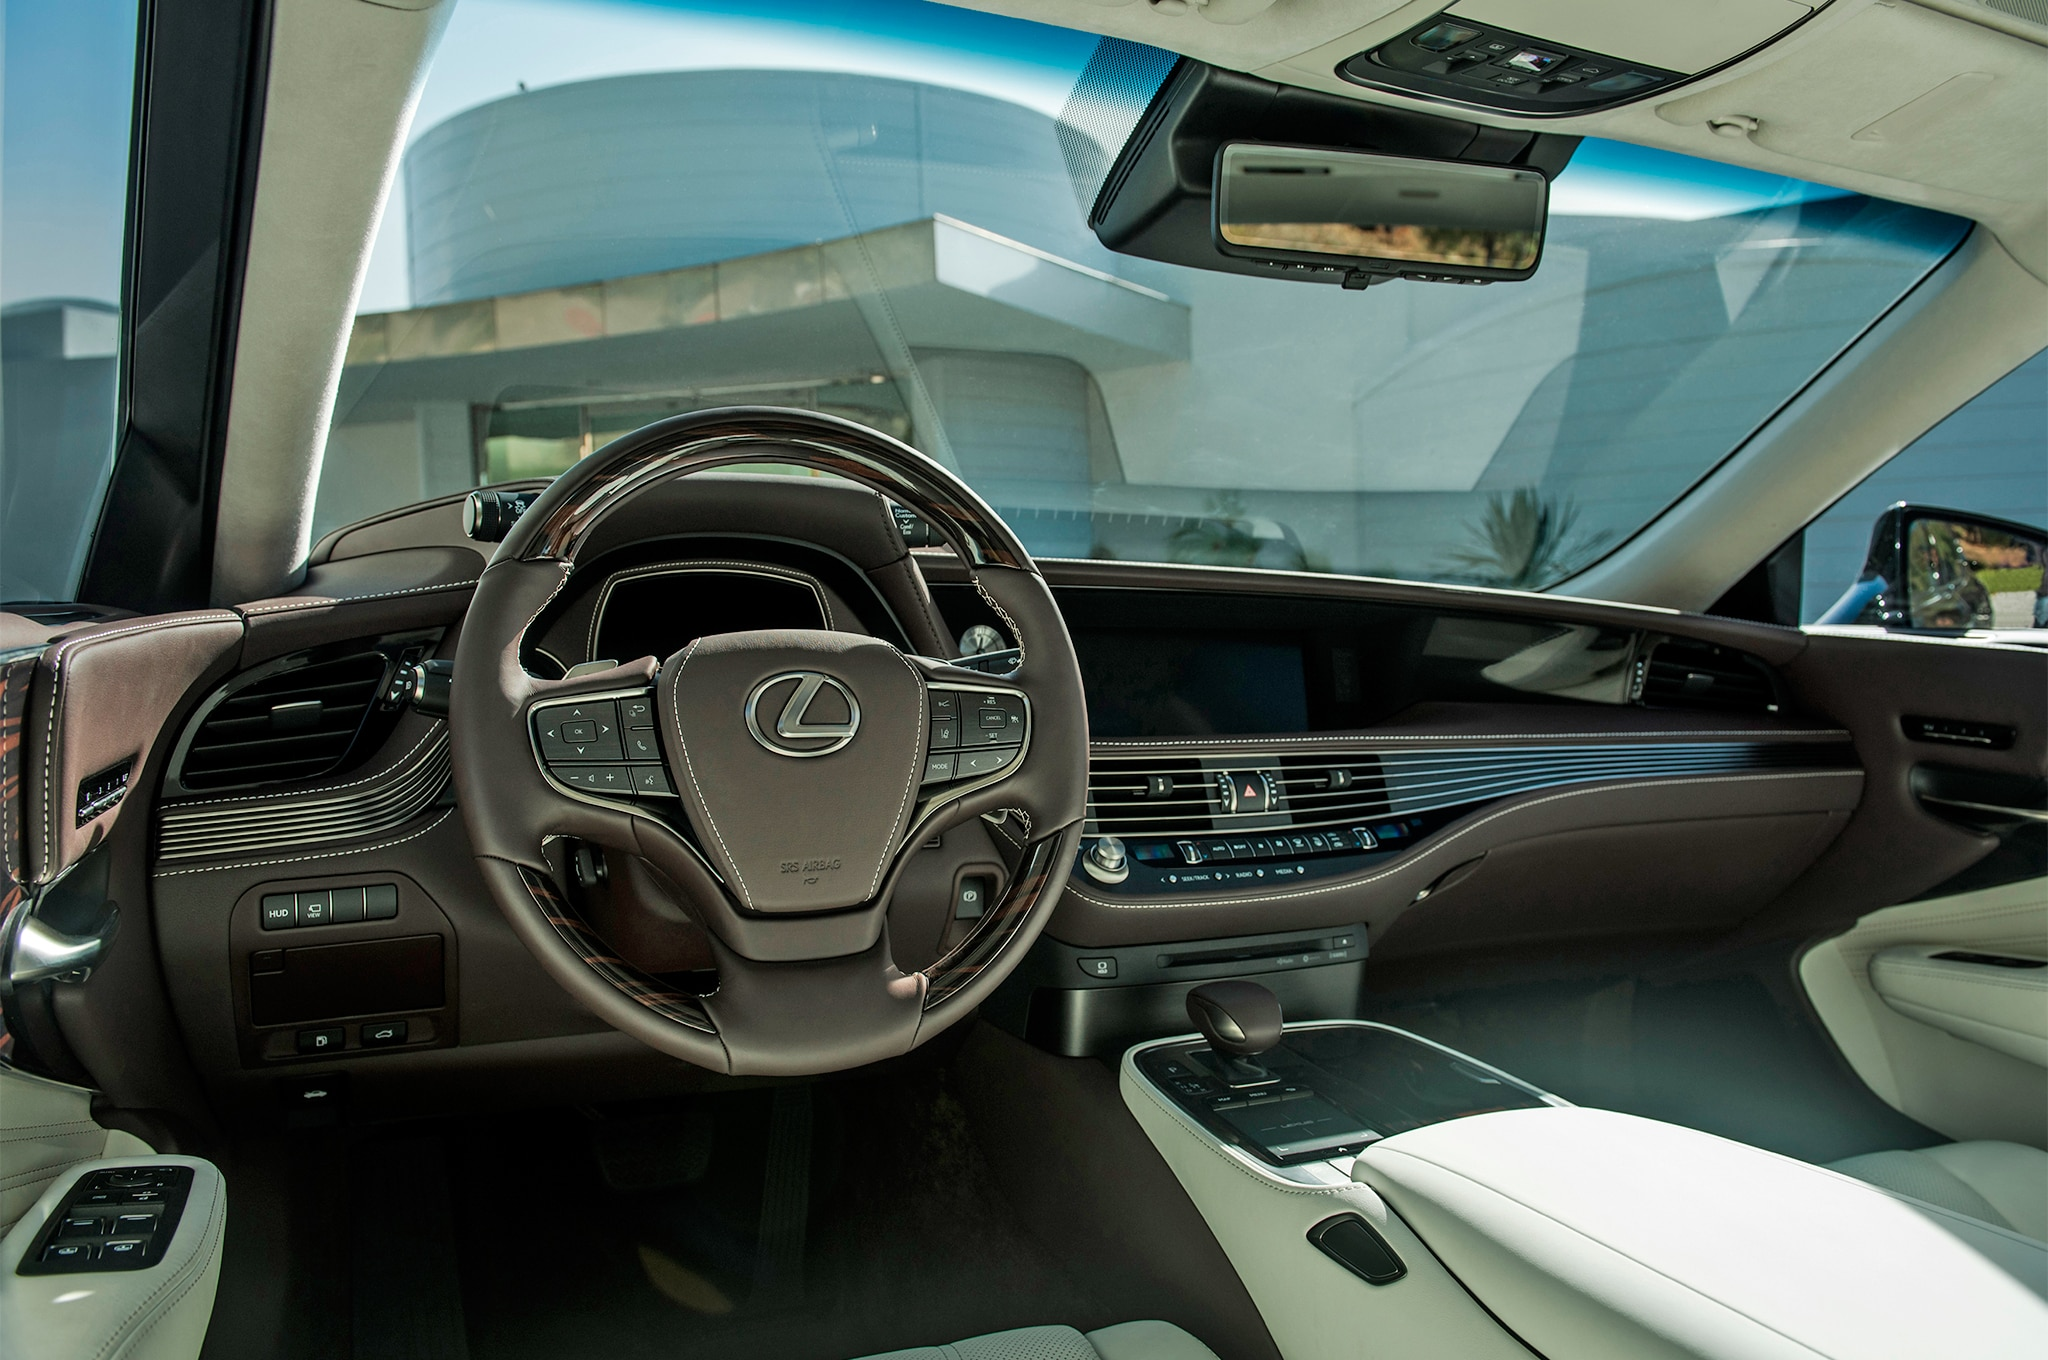 2018 Lexus LS 500 F Sport Adds Visual Aggression, Handling Pack to Halo Sedan | Automobile Magazine